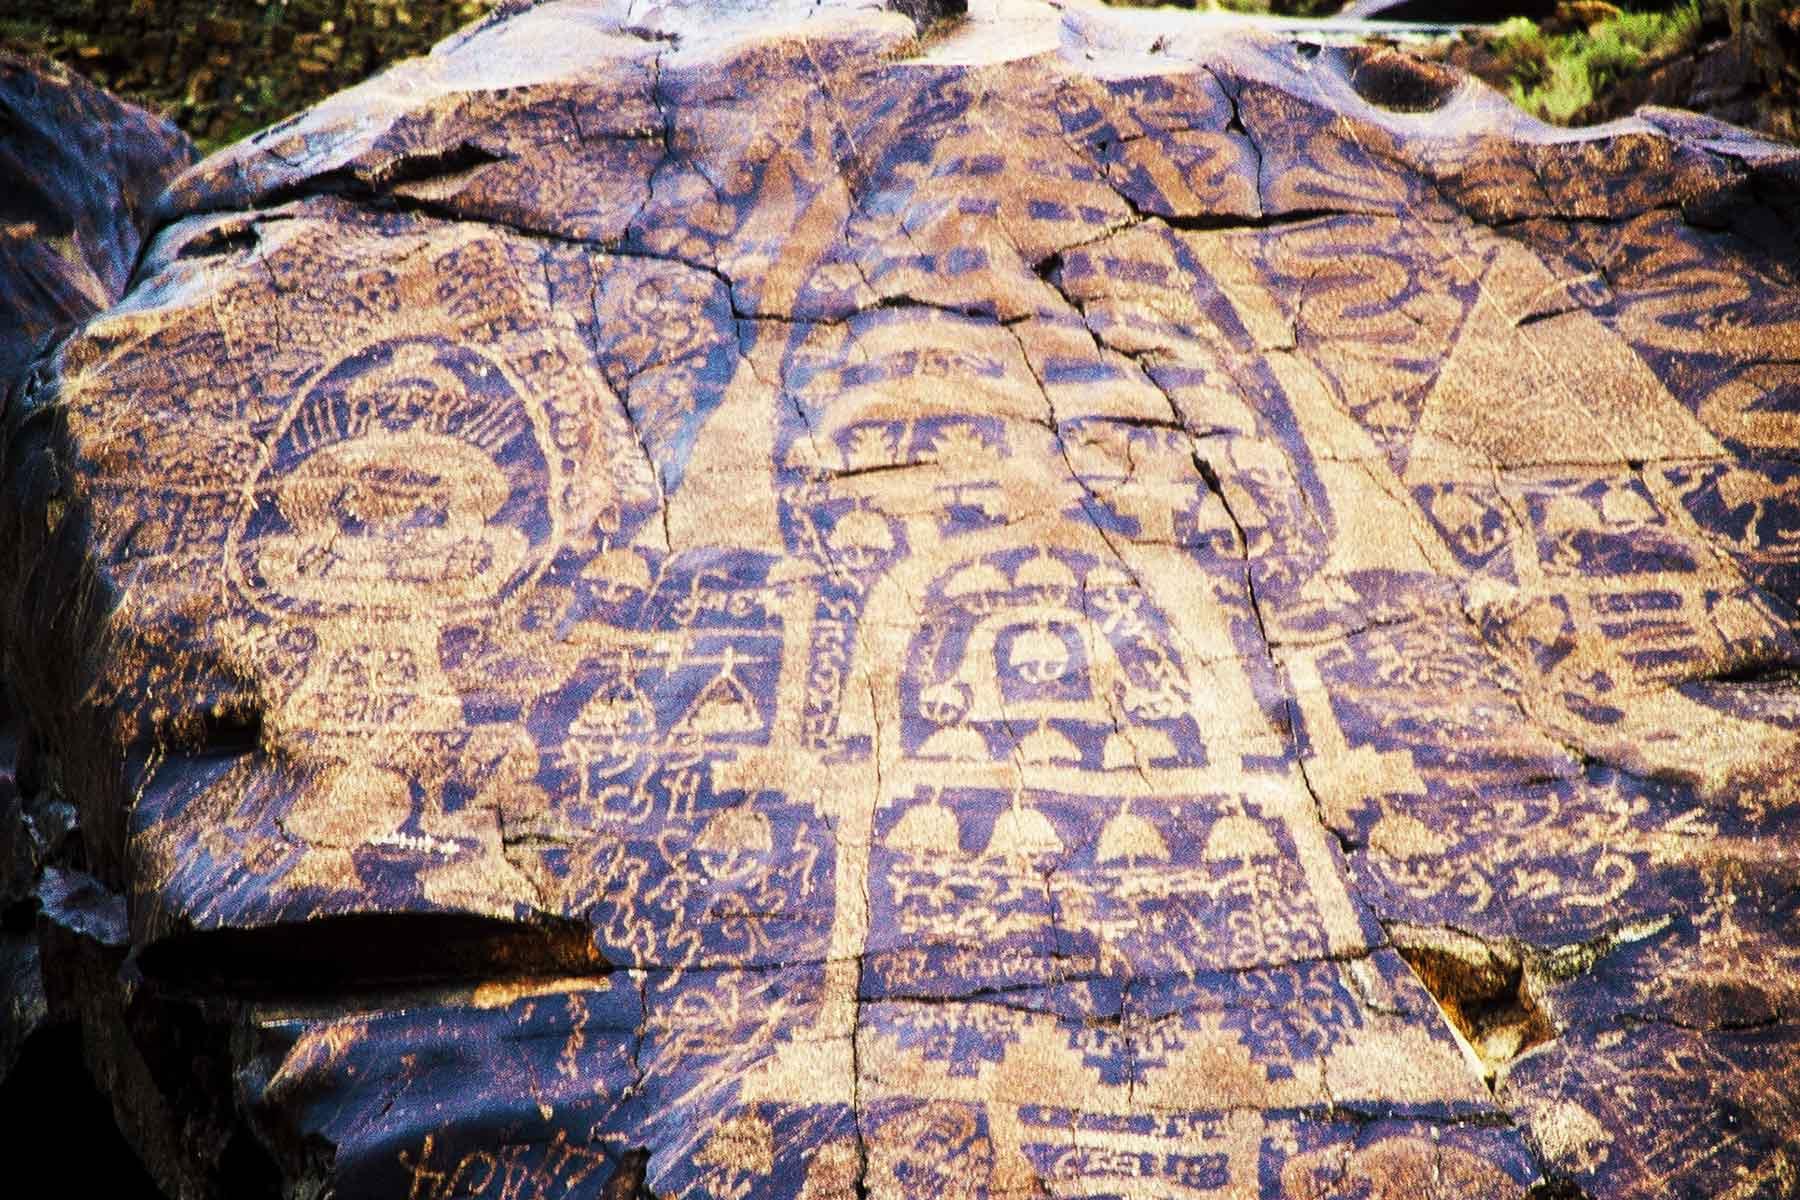 Buddhist rock carvings | Indus River | Shatial Chilas Pakistan | Steven Andrew Martin | Silk Road | Sogdian Iranian Civilization